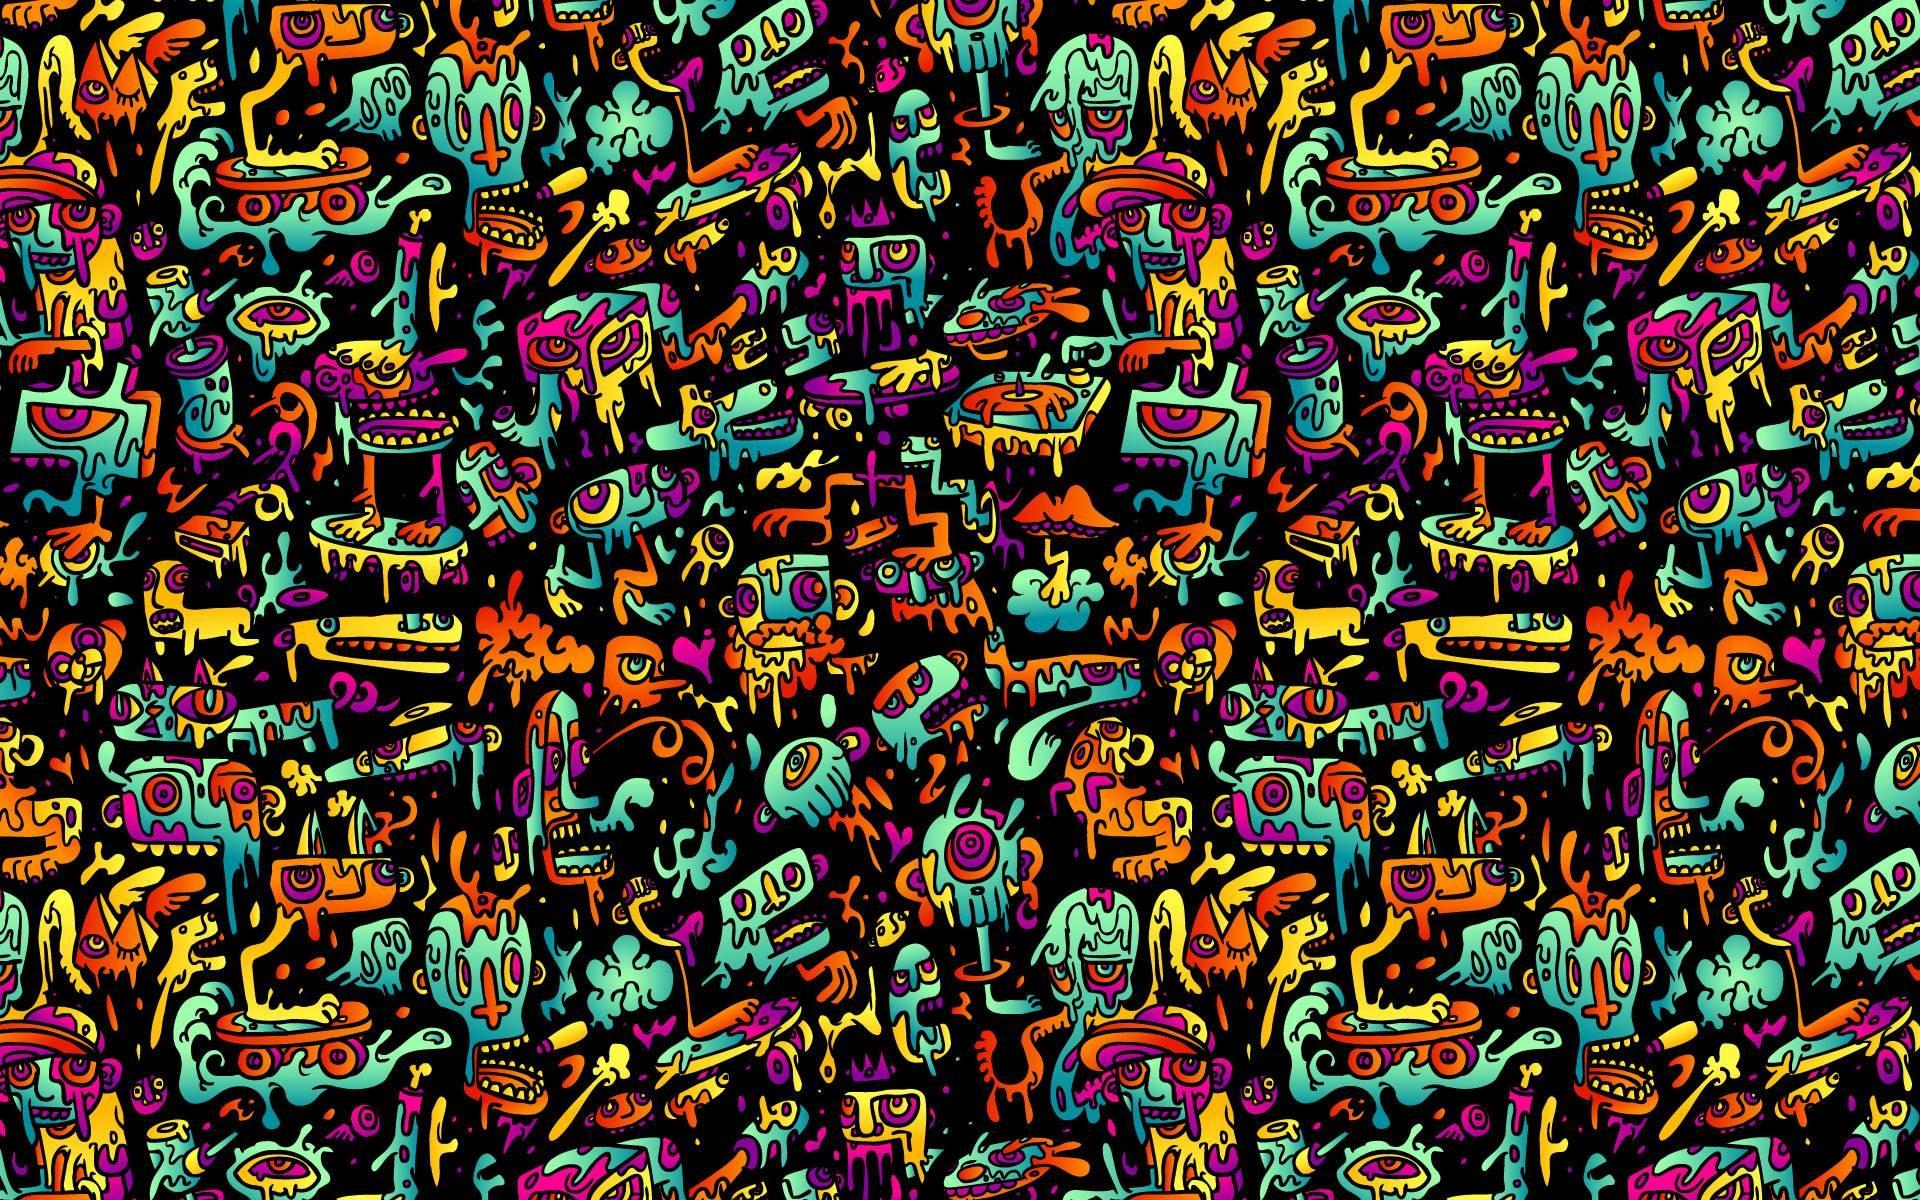 Psychedelic wallpaper – Psychedelic wallpaper hd – Psychedelic .